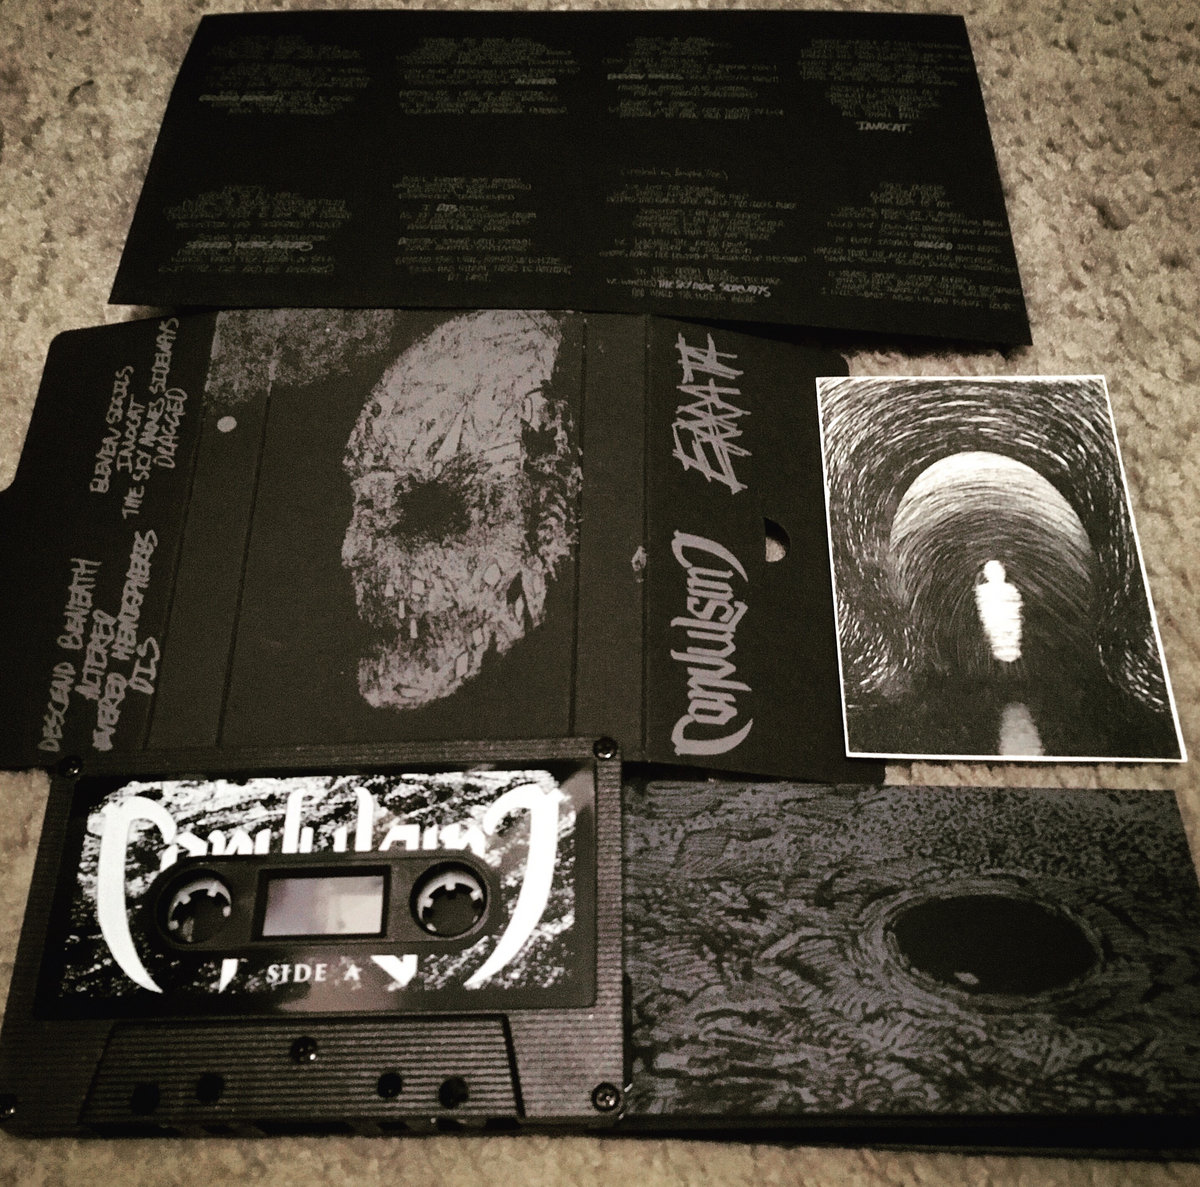 porcupine tree mp3 album download free